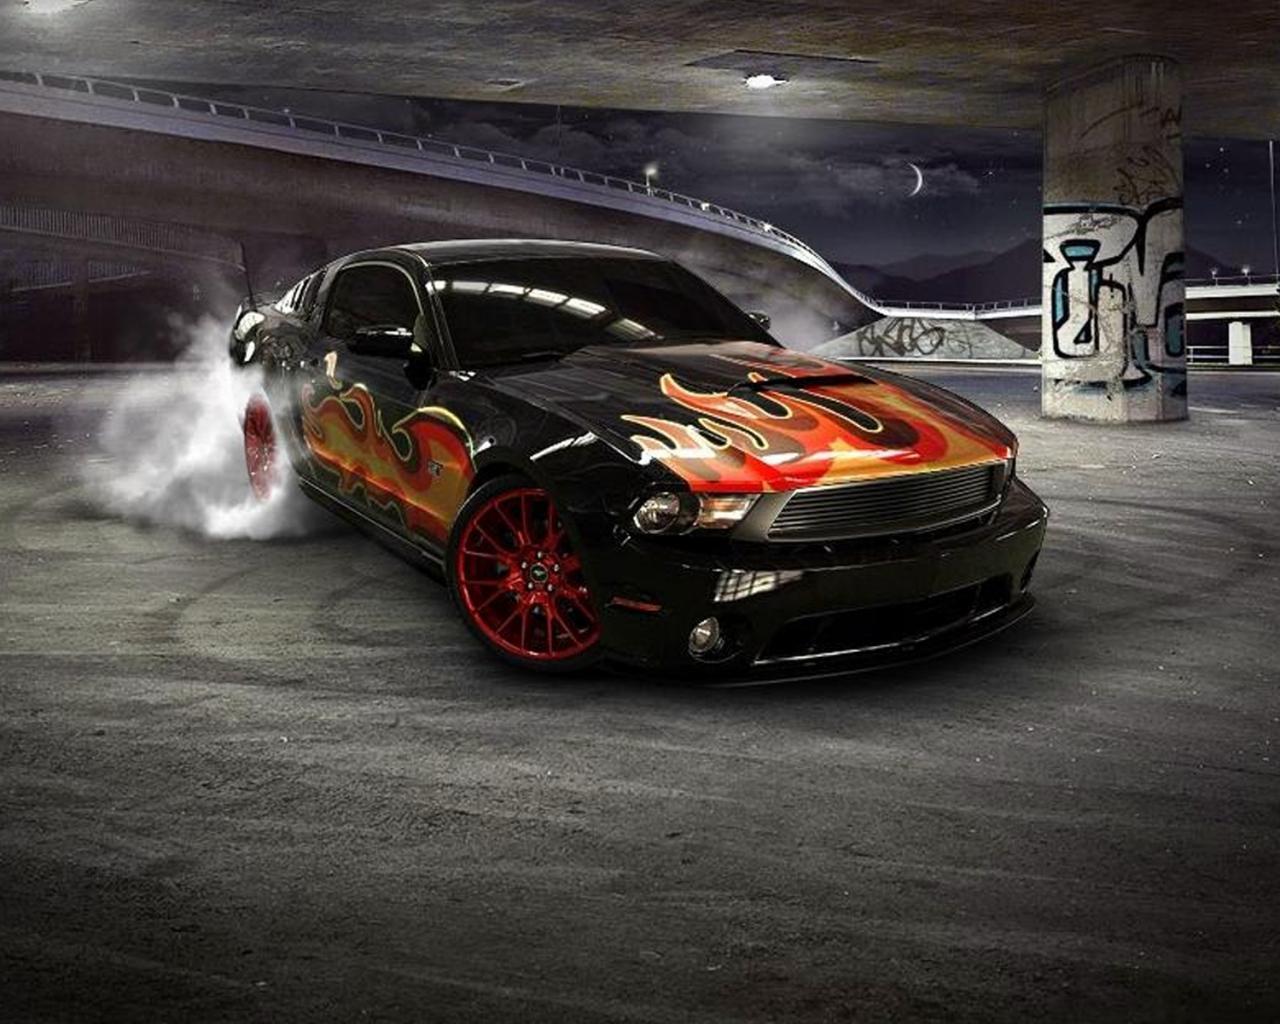 Hd Wallpapers 1280x1024 Cars Машина скорость дрифт автомобили машины авто обои для